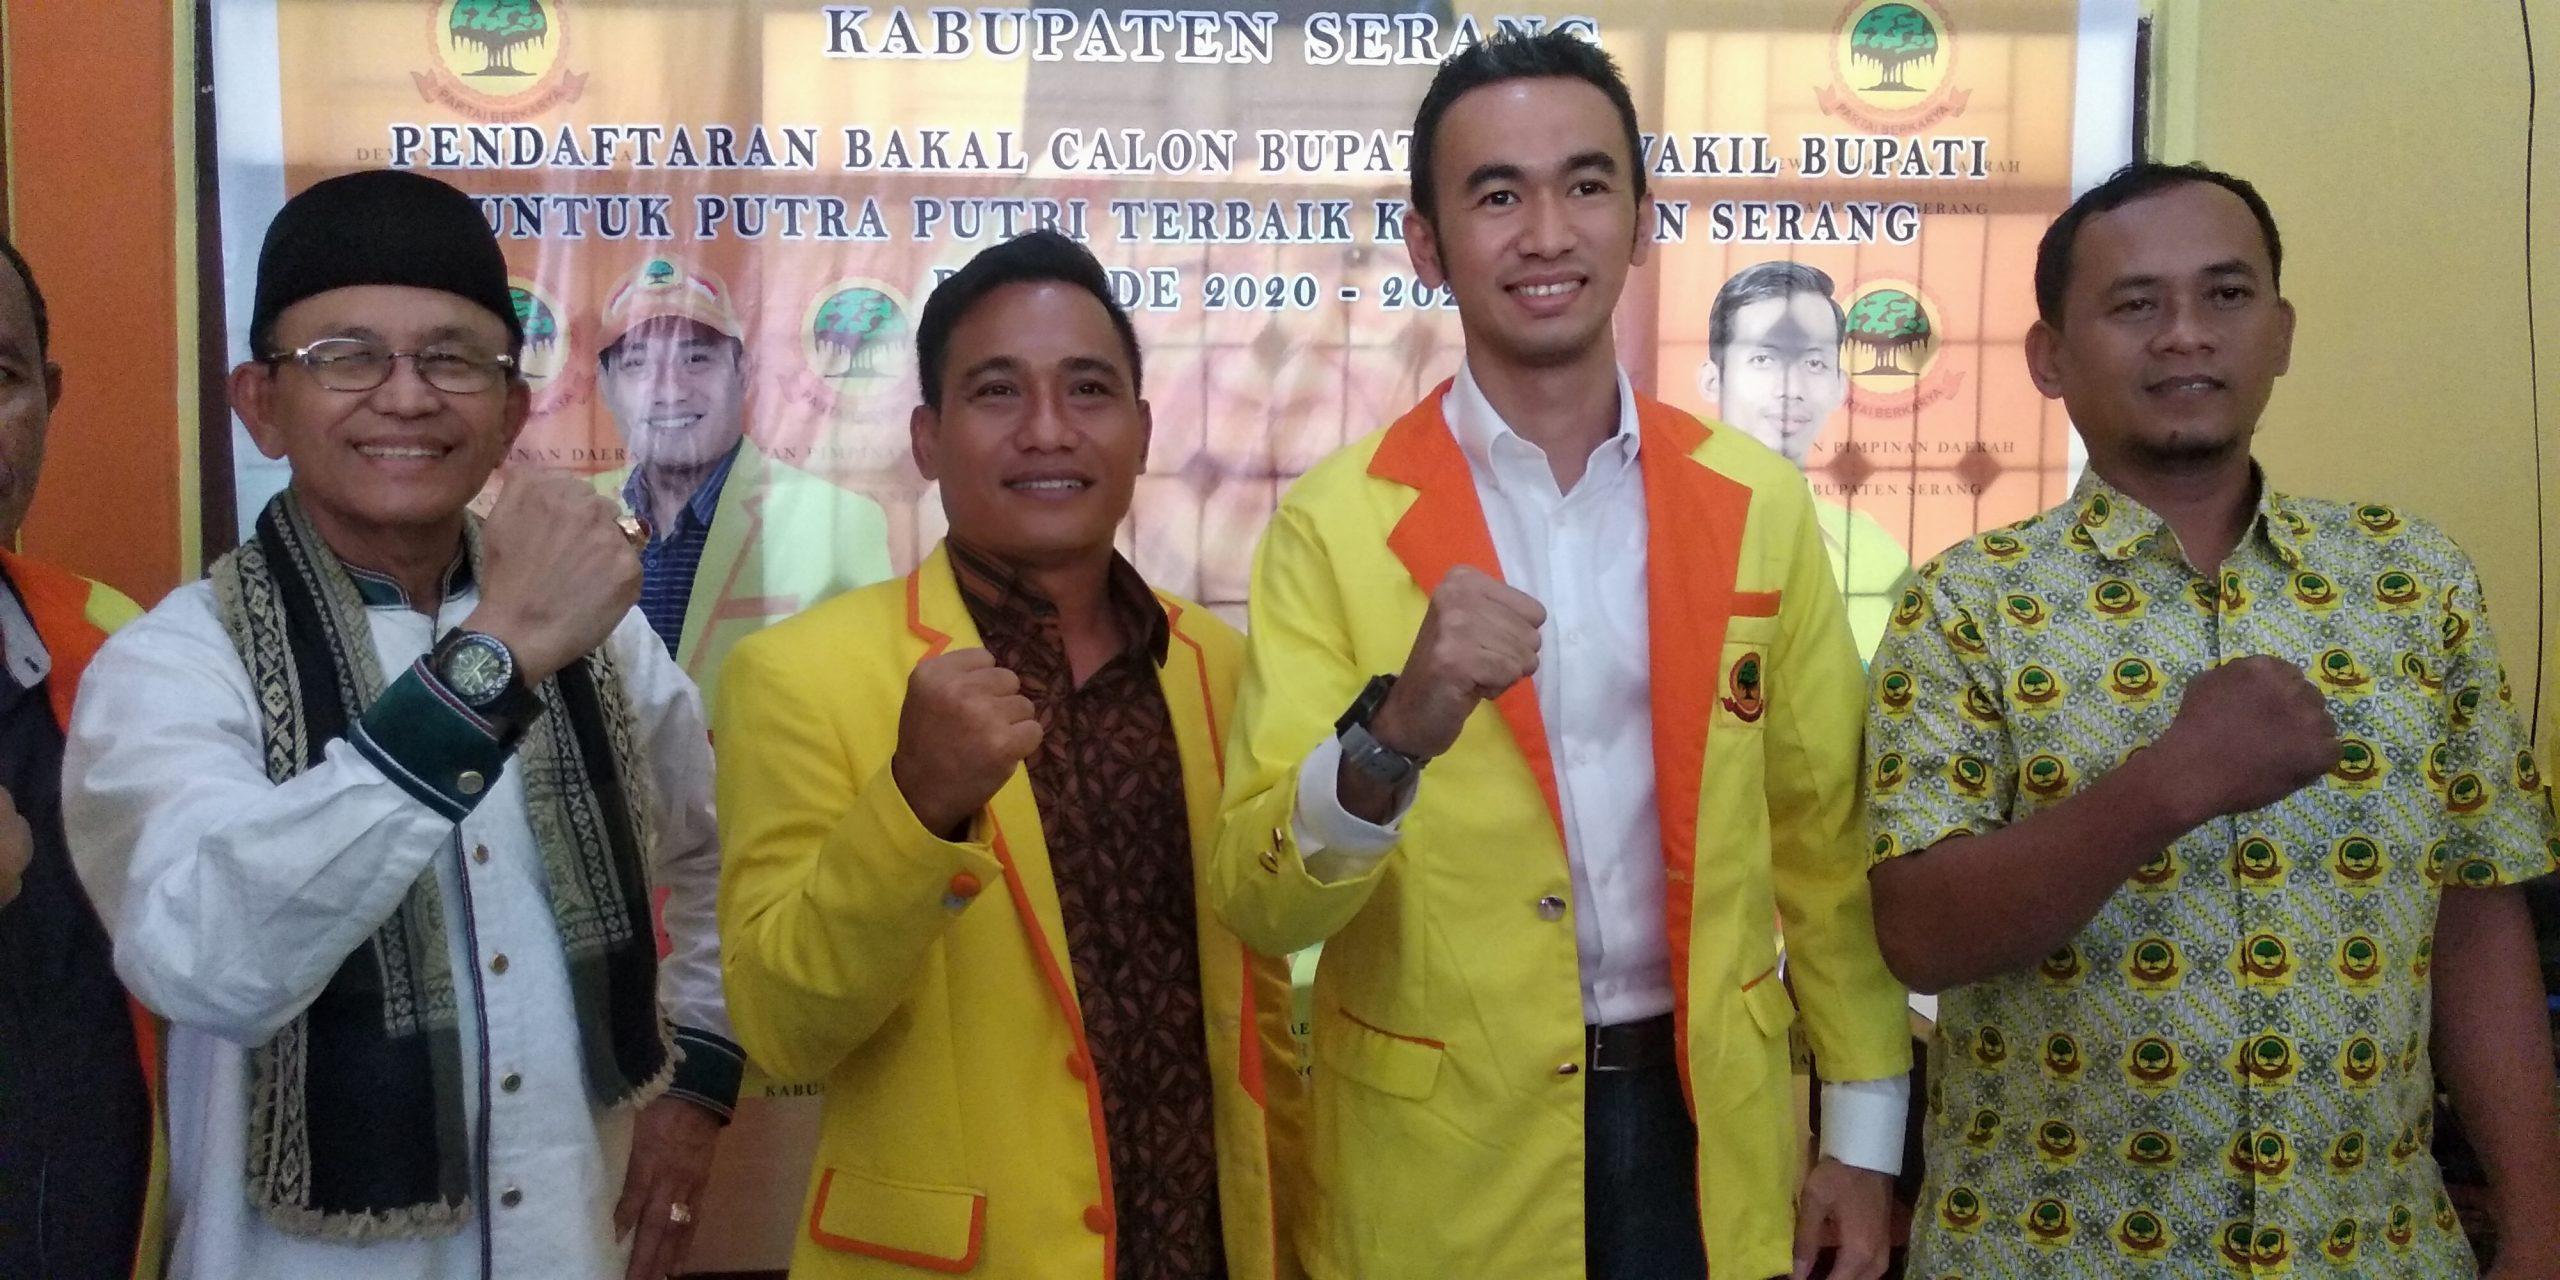 Bawaslu Nyatakan Orasi 'Orang Prabowo' soal Pengangguran Tinggi di Kabupaten Serang Tak Penuhi Unsur Pidana Pemilu